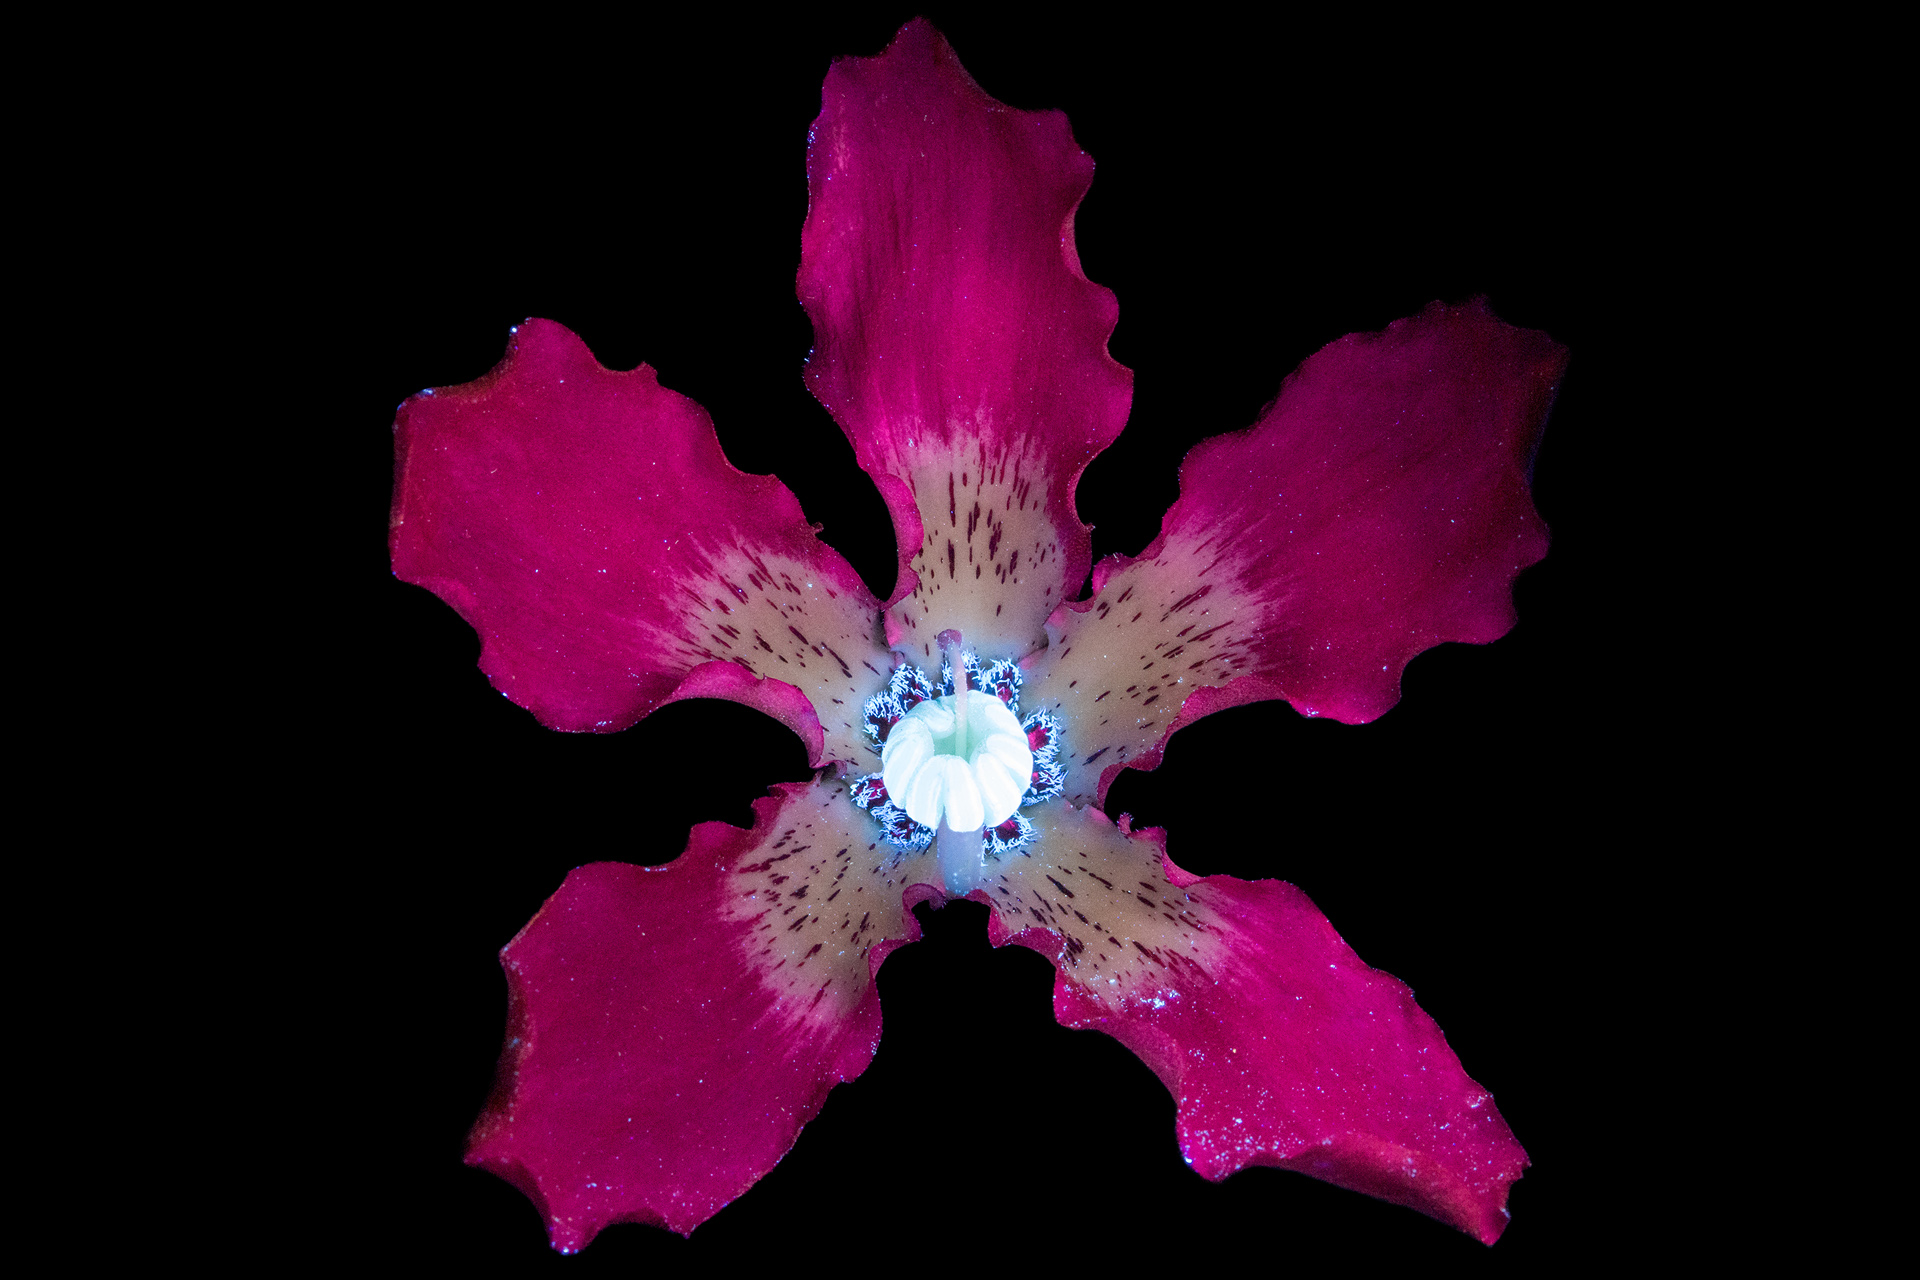 http://i0.wp.com/www.cpburrows.com/wp-content/uploads/2017/01/Silk-Floss-Tree-Flower-2s-1.jpg?fit=1920%2C1280